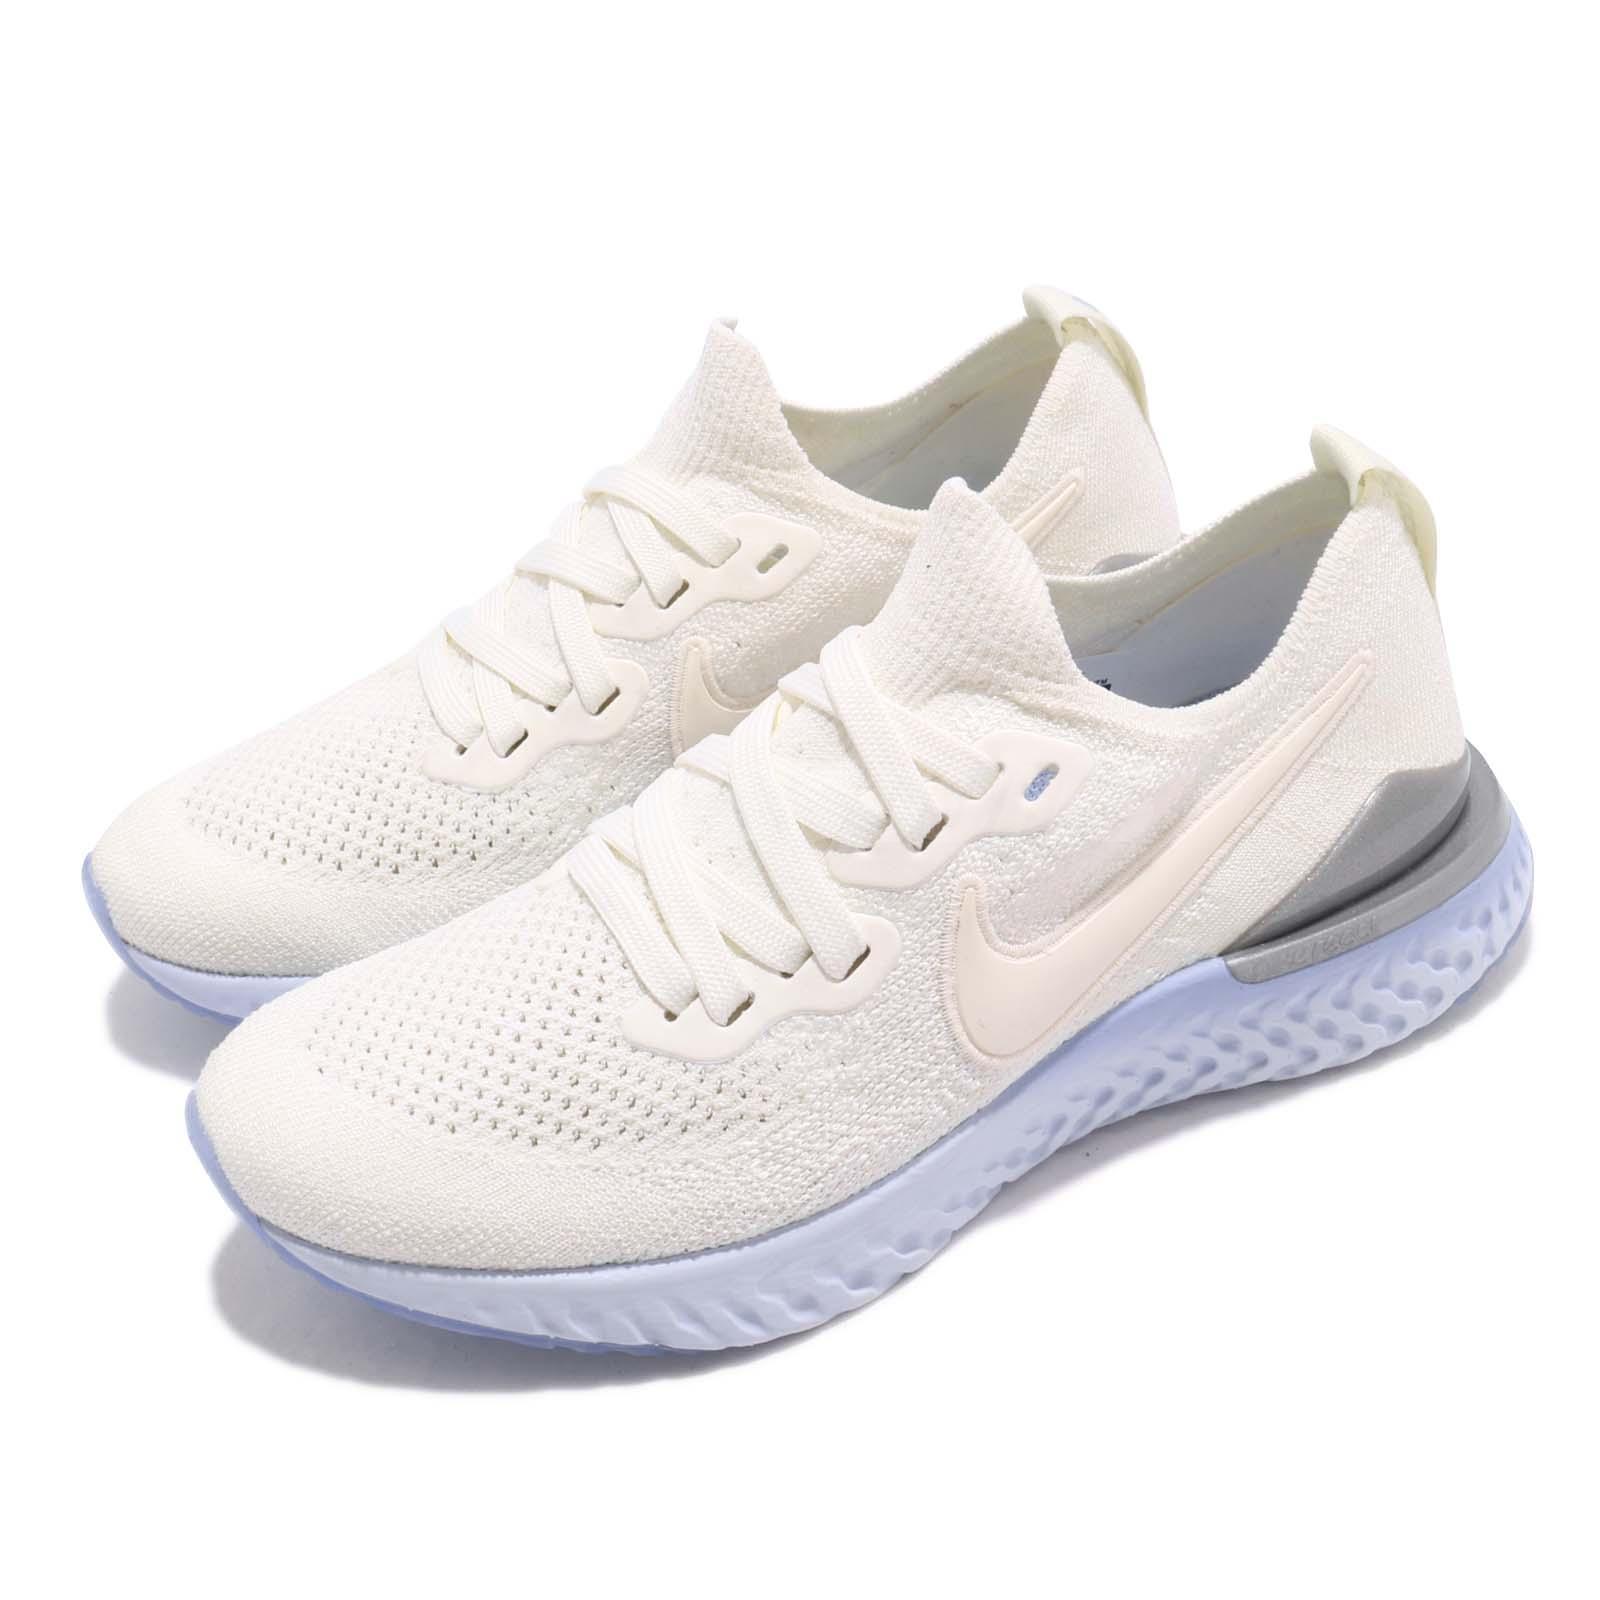 Nike Wmns Epic React Flyknit 2 Sail Silver Women Running Shoe ... 5b2ab0a63